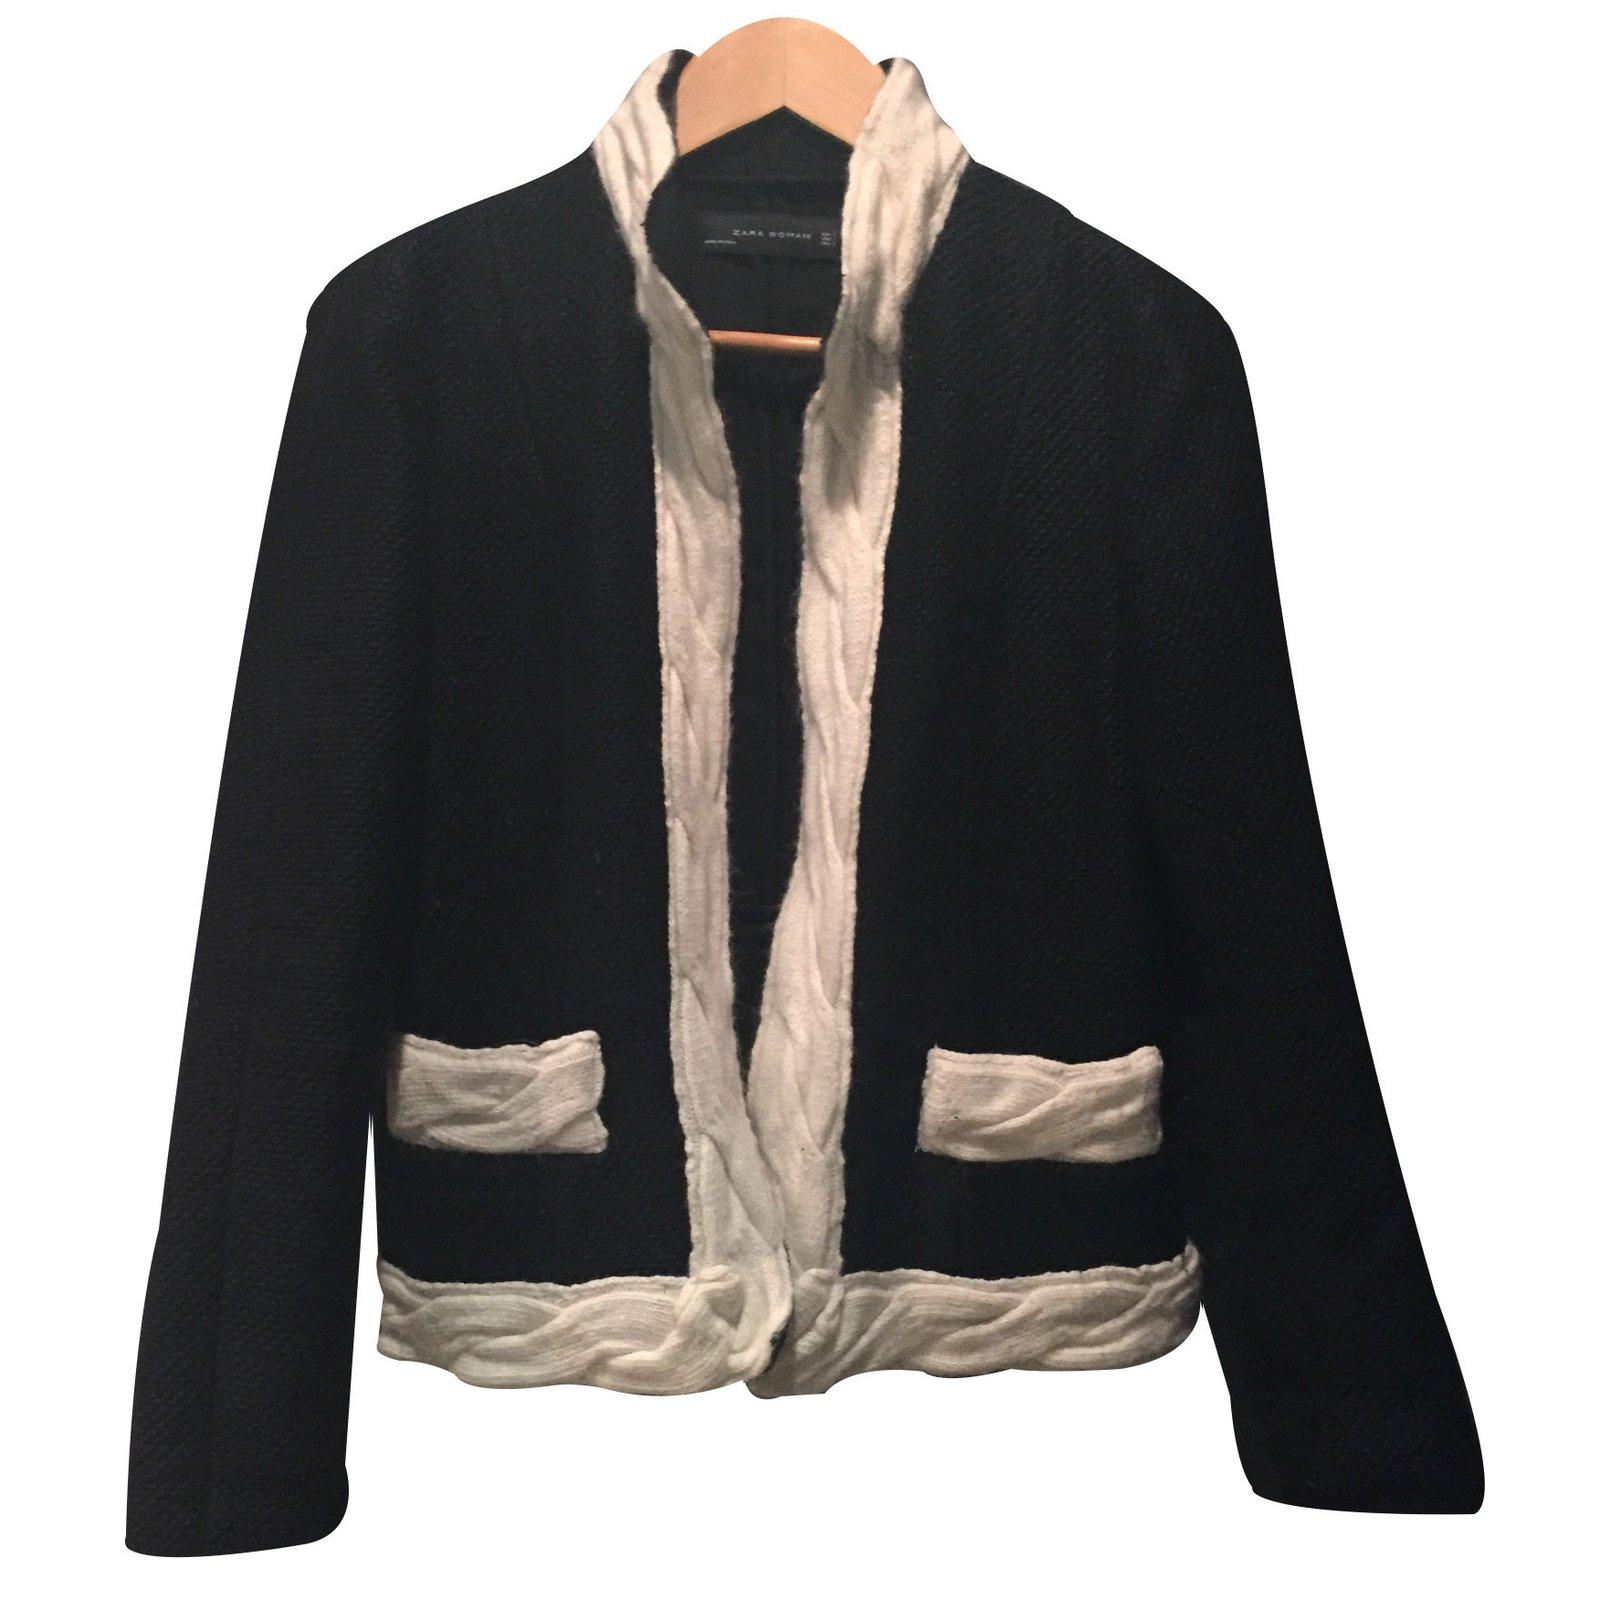 Noir Autre Vestes Closet 15433 Ref Joli Zara xfEEAwqSC 189e08bbf17